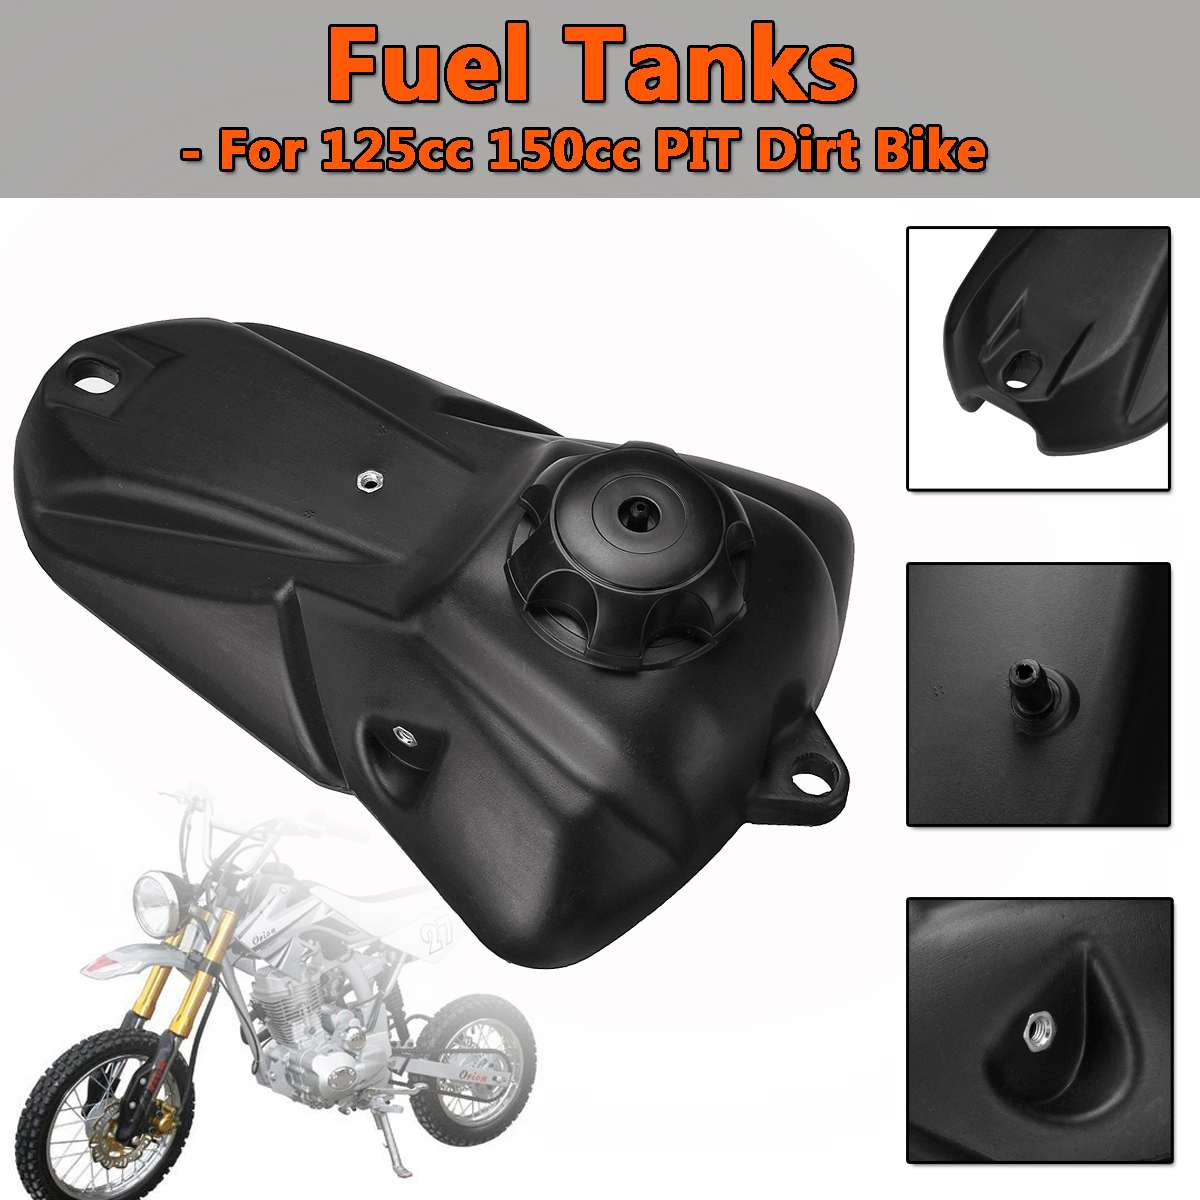 Tanque de combustible para motocicleta para 125cc 150cc PIT PRO Trail Dirt Bike negro Gas gasolina tanques de combustible con tapa nuevo Minimotor Motocross